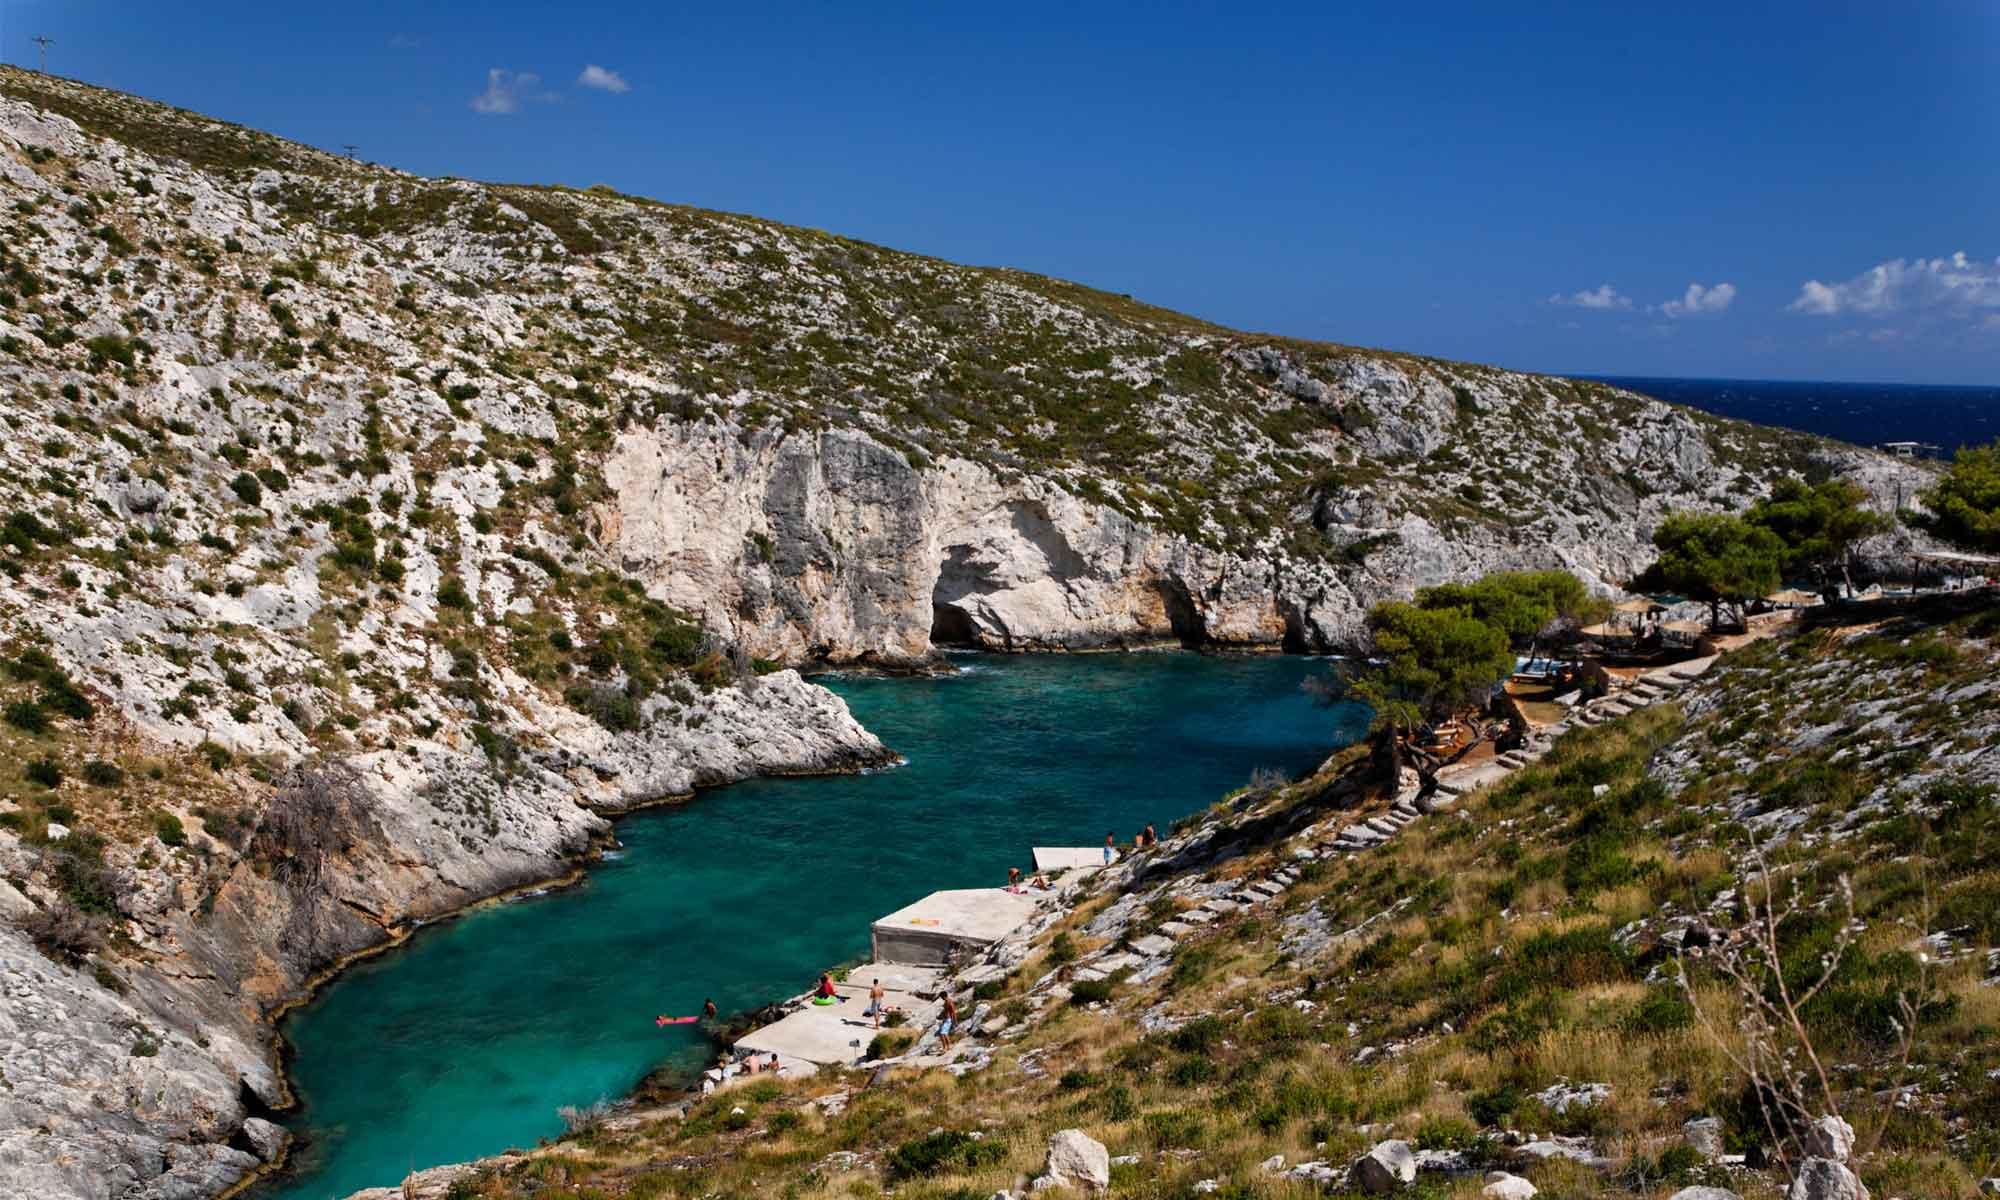 Slow Dive Angebote Griechenland Zakynthos Klippen